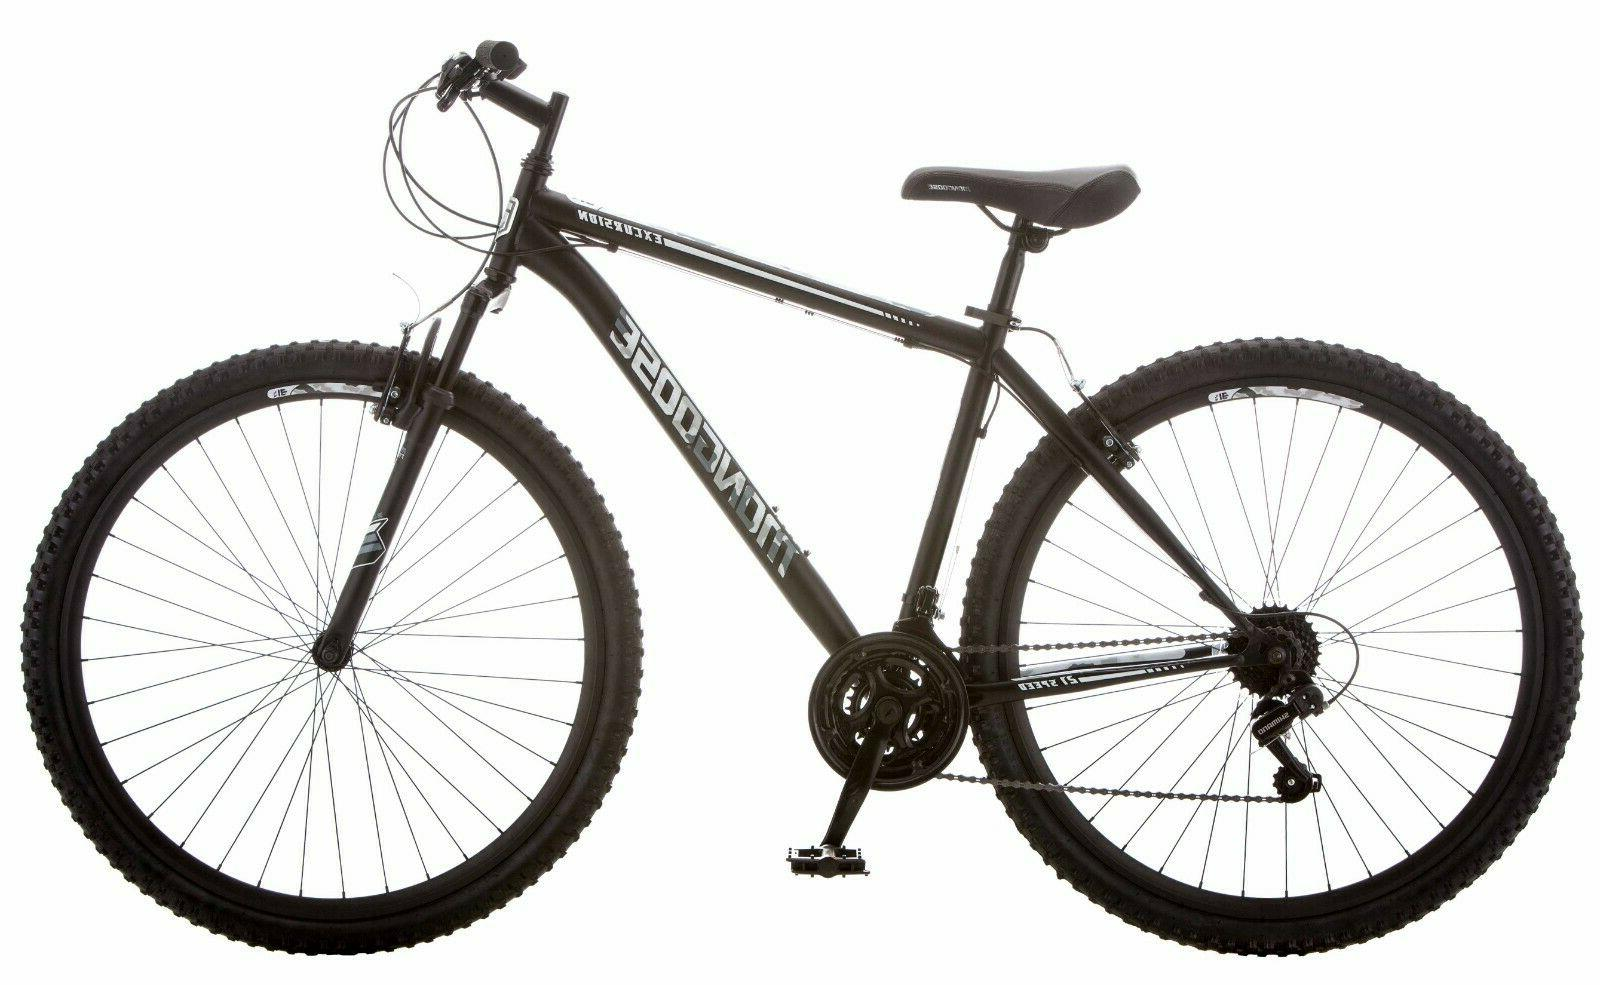 Mens Mountain Bike 21 Speed Road Tires Bicycle